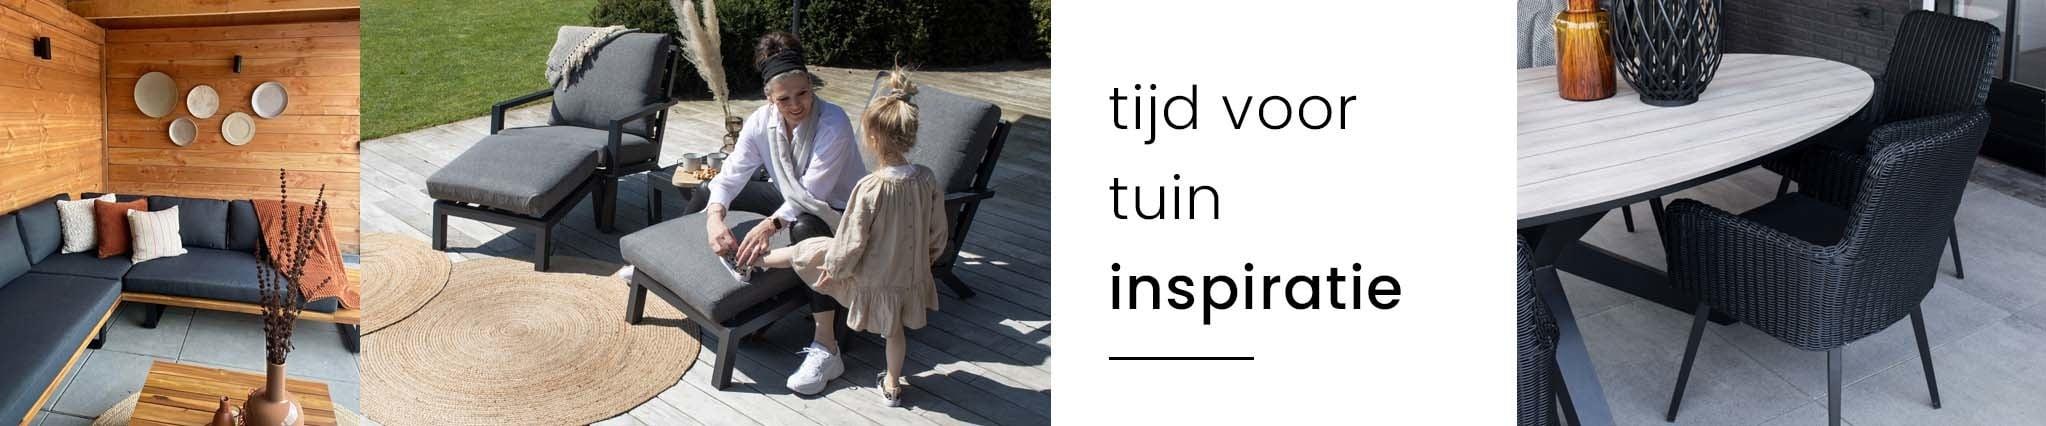 Gratis inspiratiegids tuinmeubelen